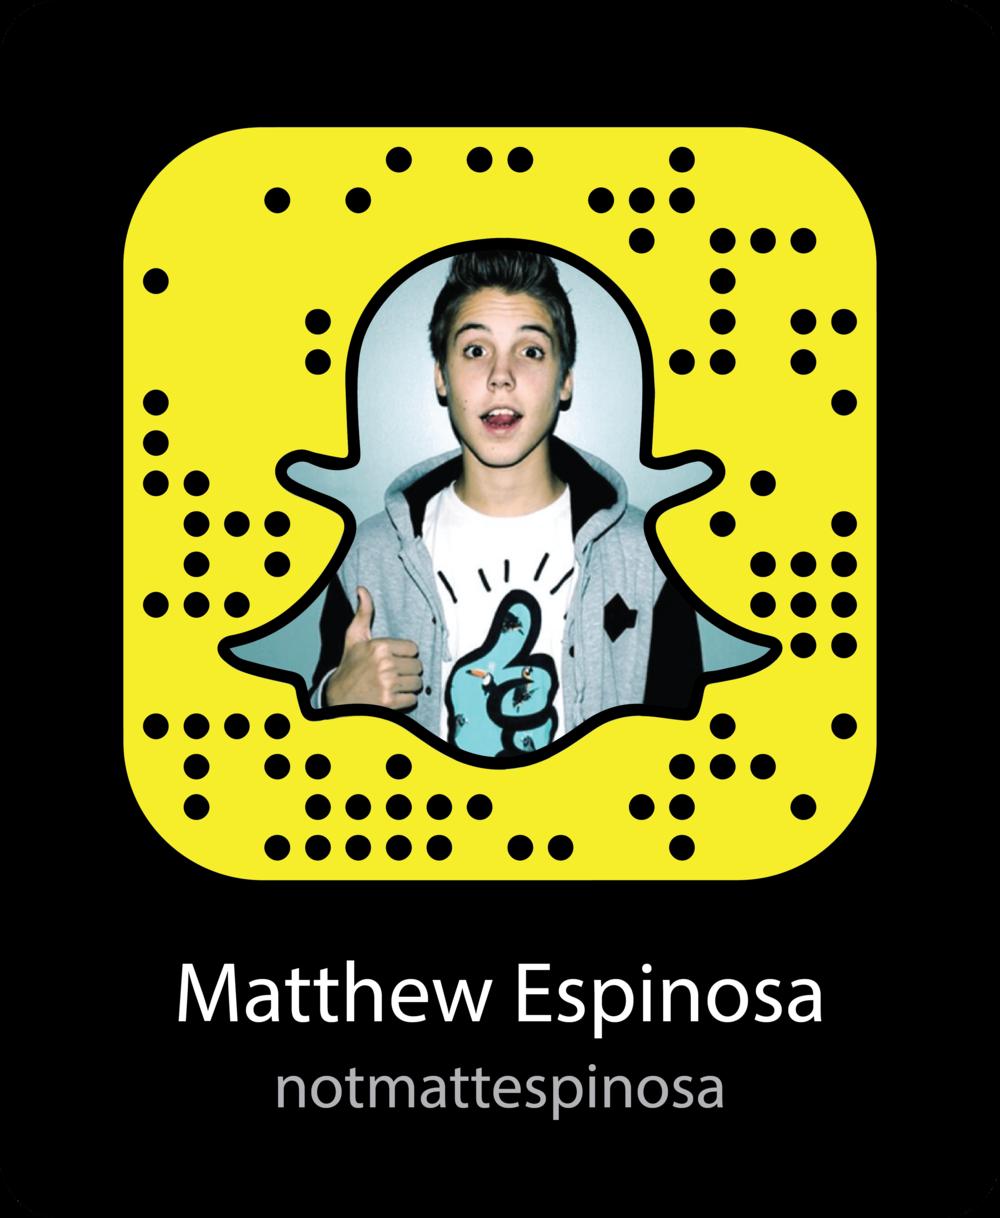 matthew-espinosa-vine-celebrity-snapchat-snapcode